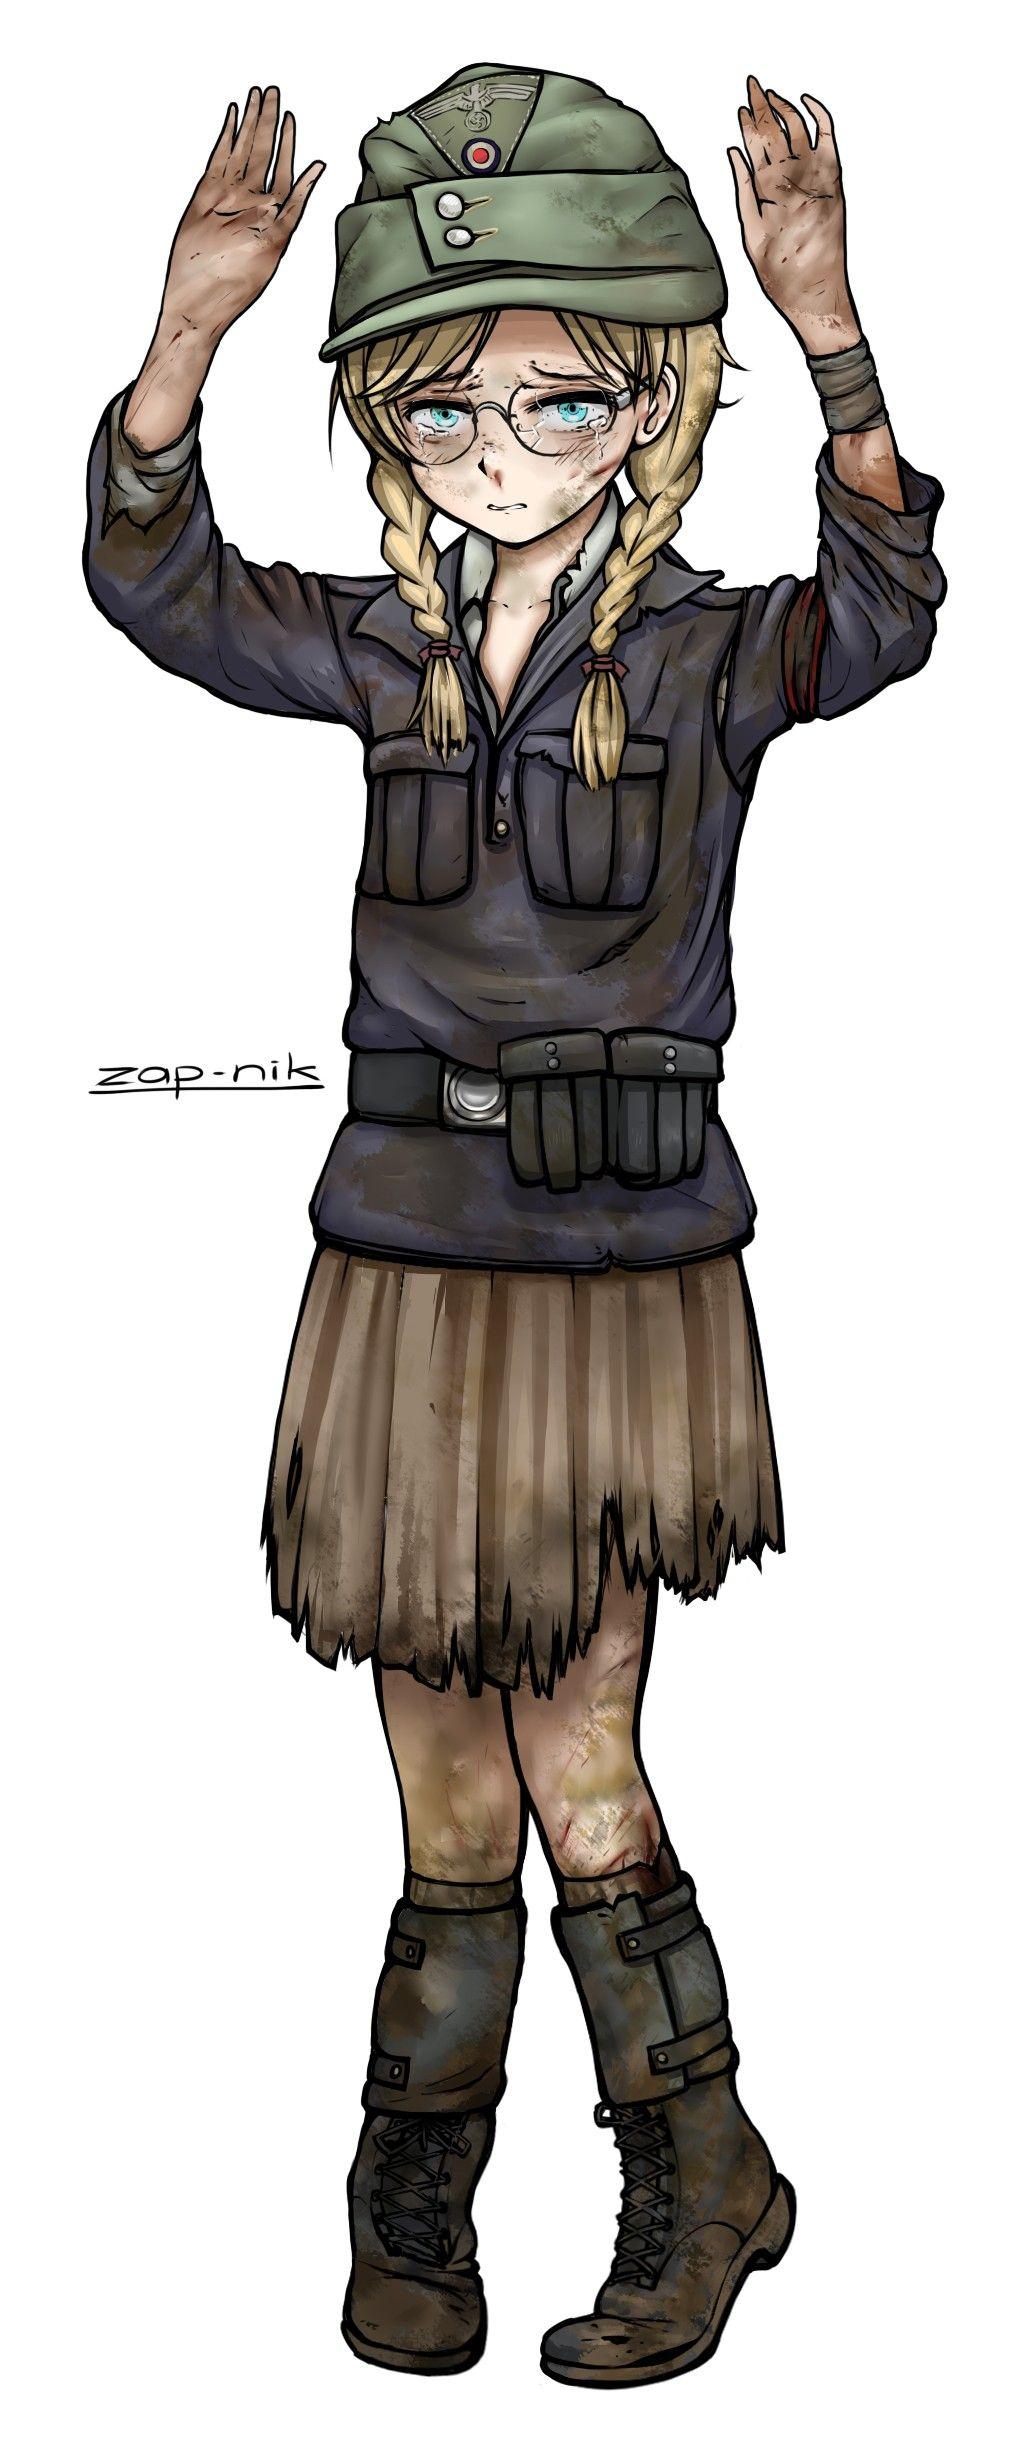 Pin de Norpino en Panzer Girls Cartoon en 2020 Militar